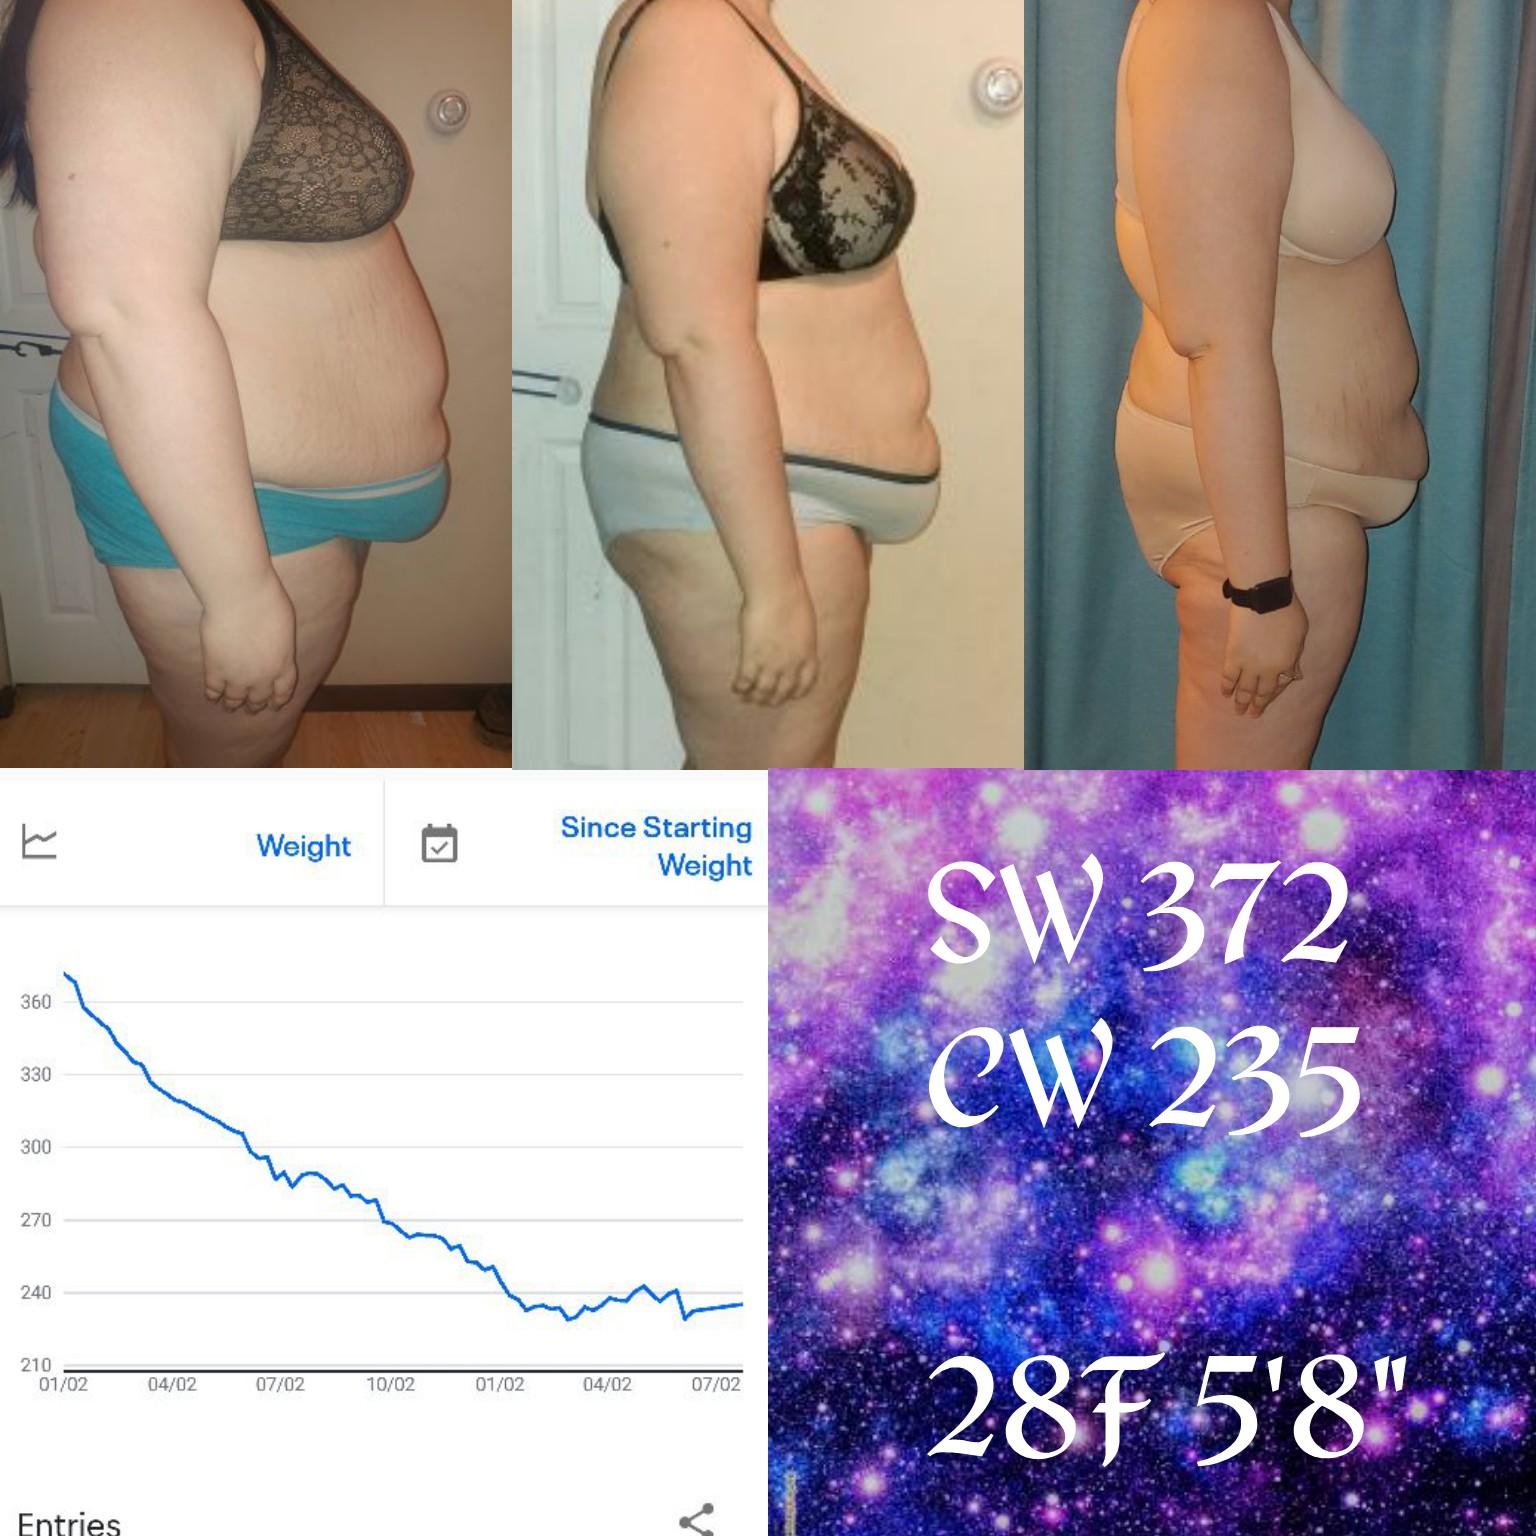 Progress Pics of 137 lbs Weight Loss 5 feet 8 Female 372 lbs to 235 lbs